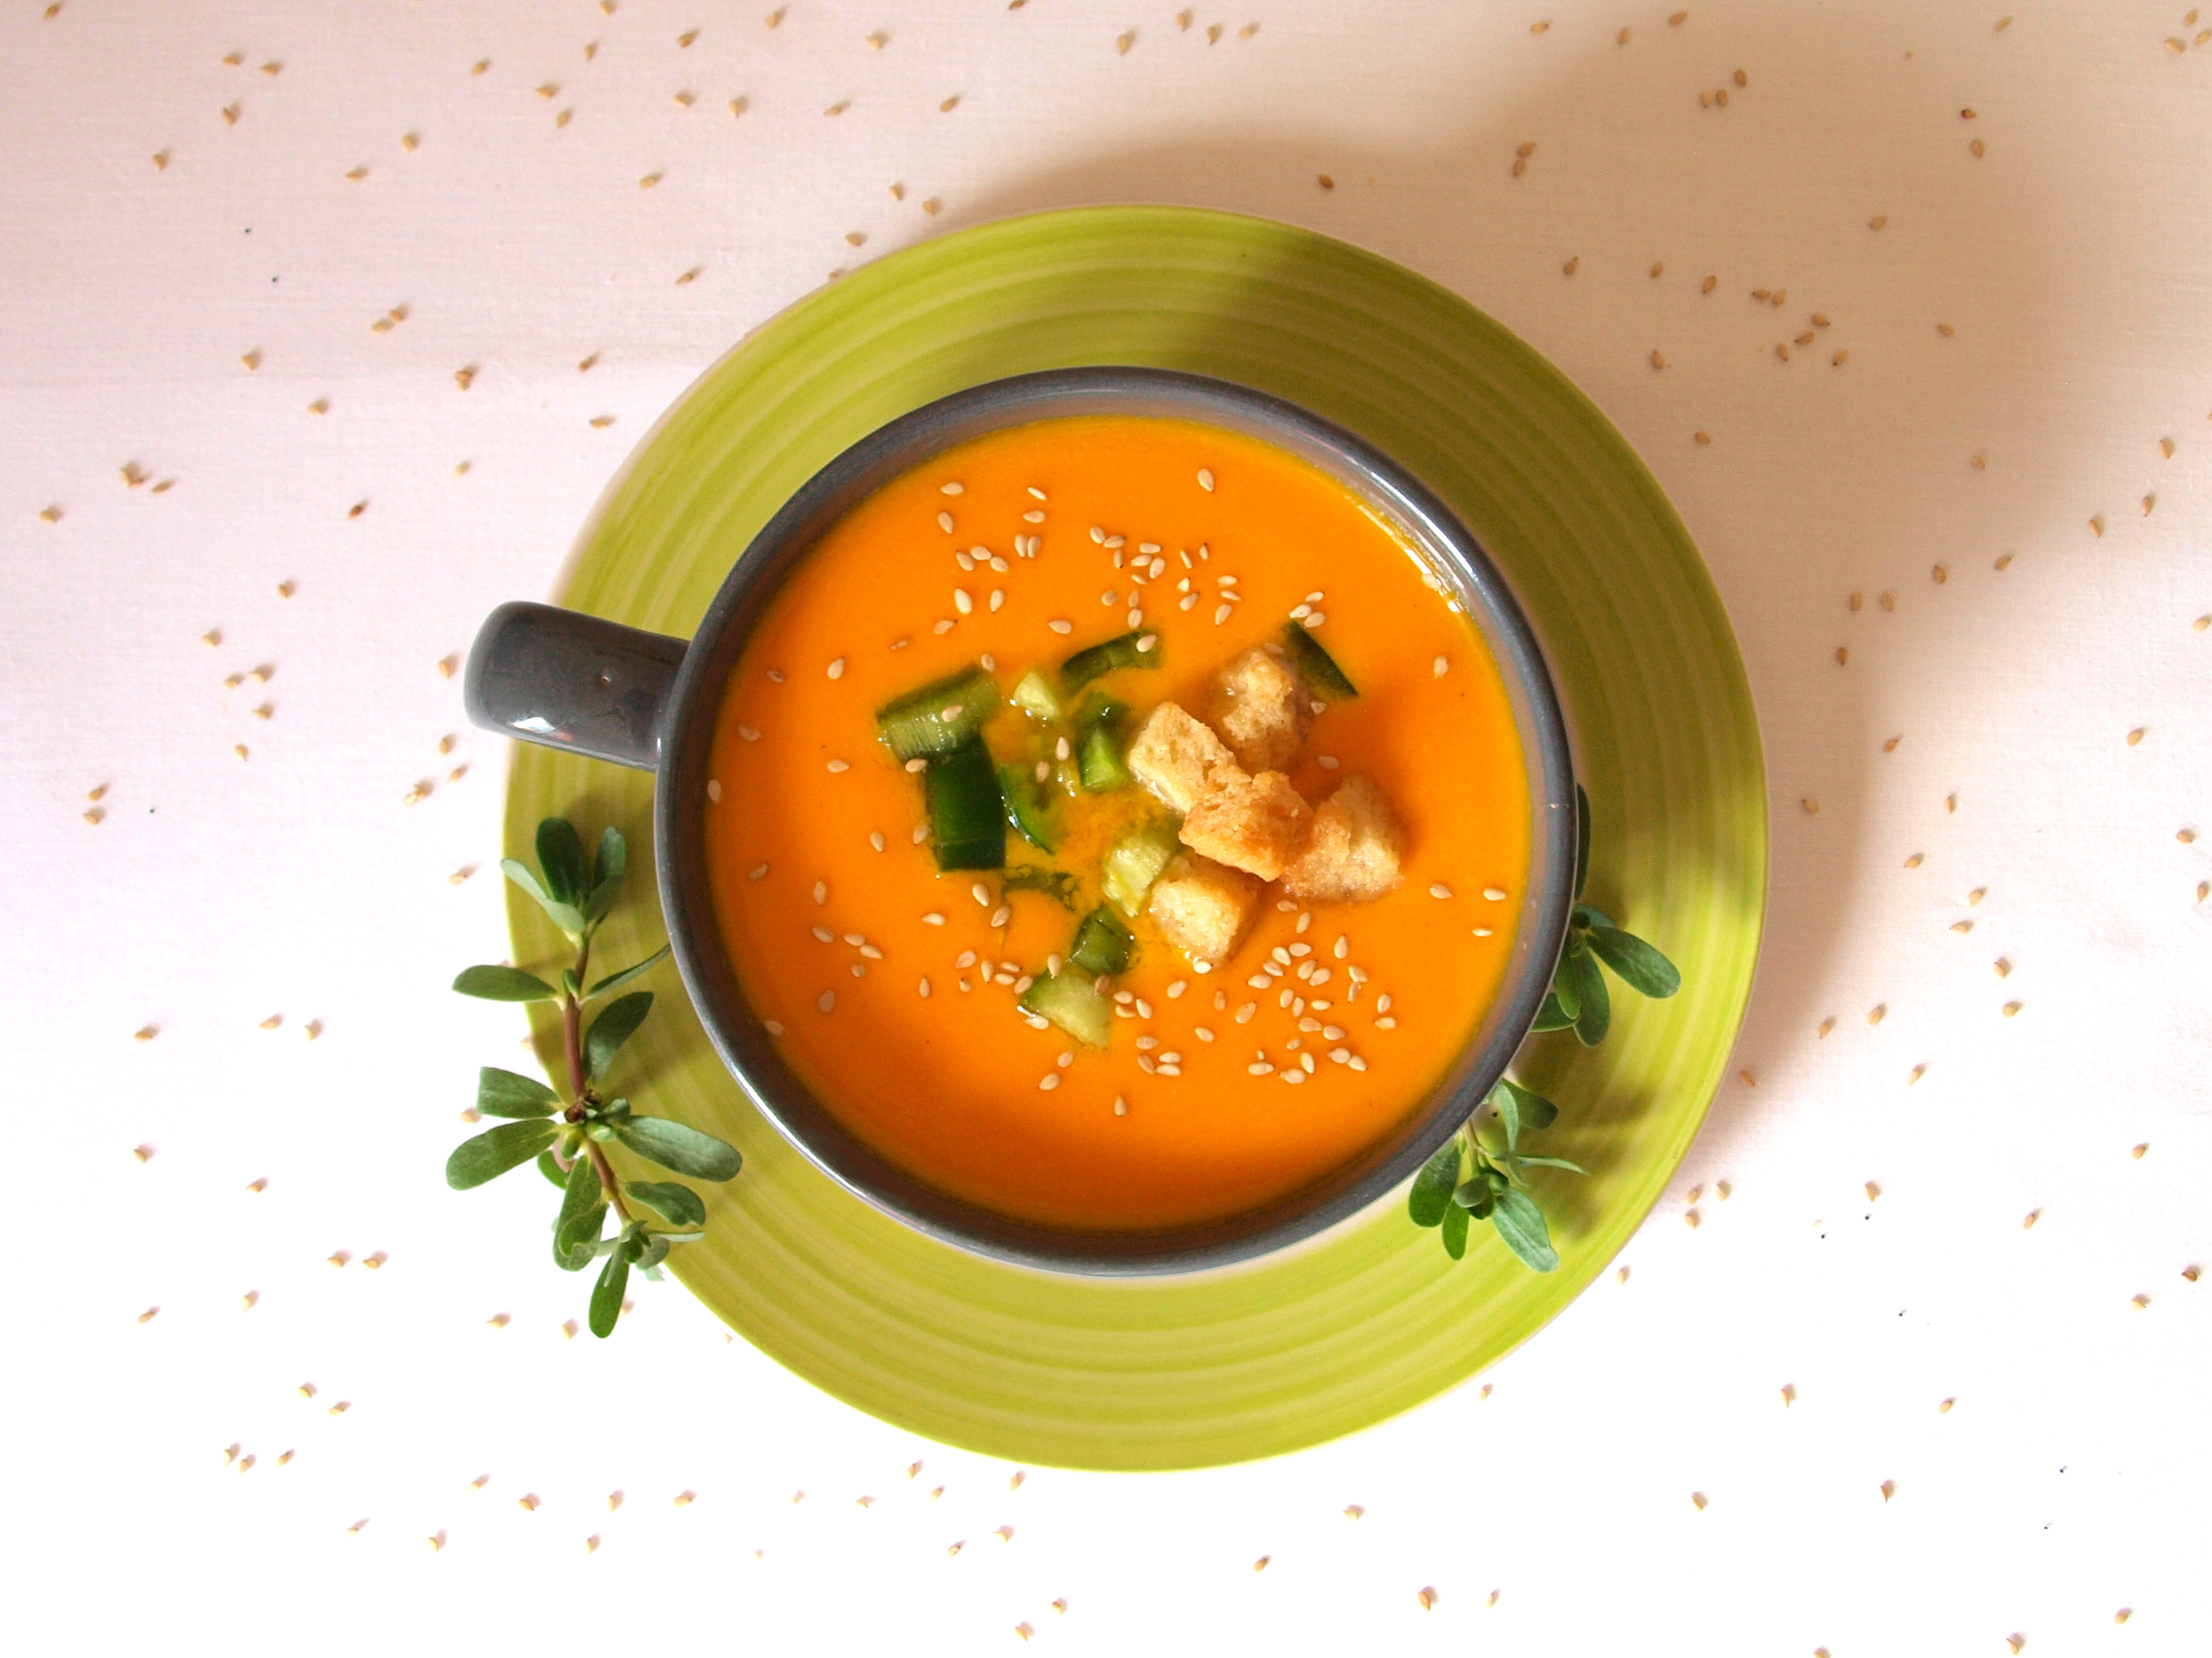 Receta vegana de gazpacho de zanahoria